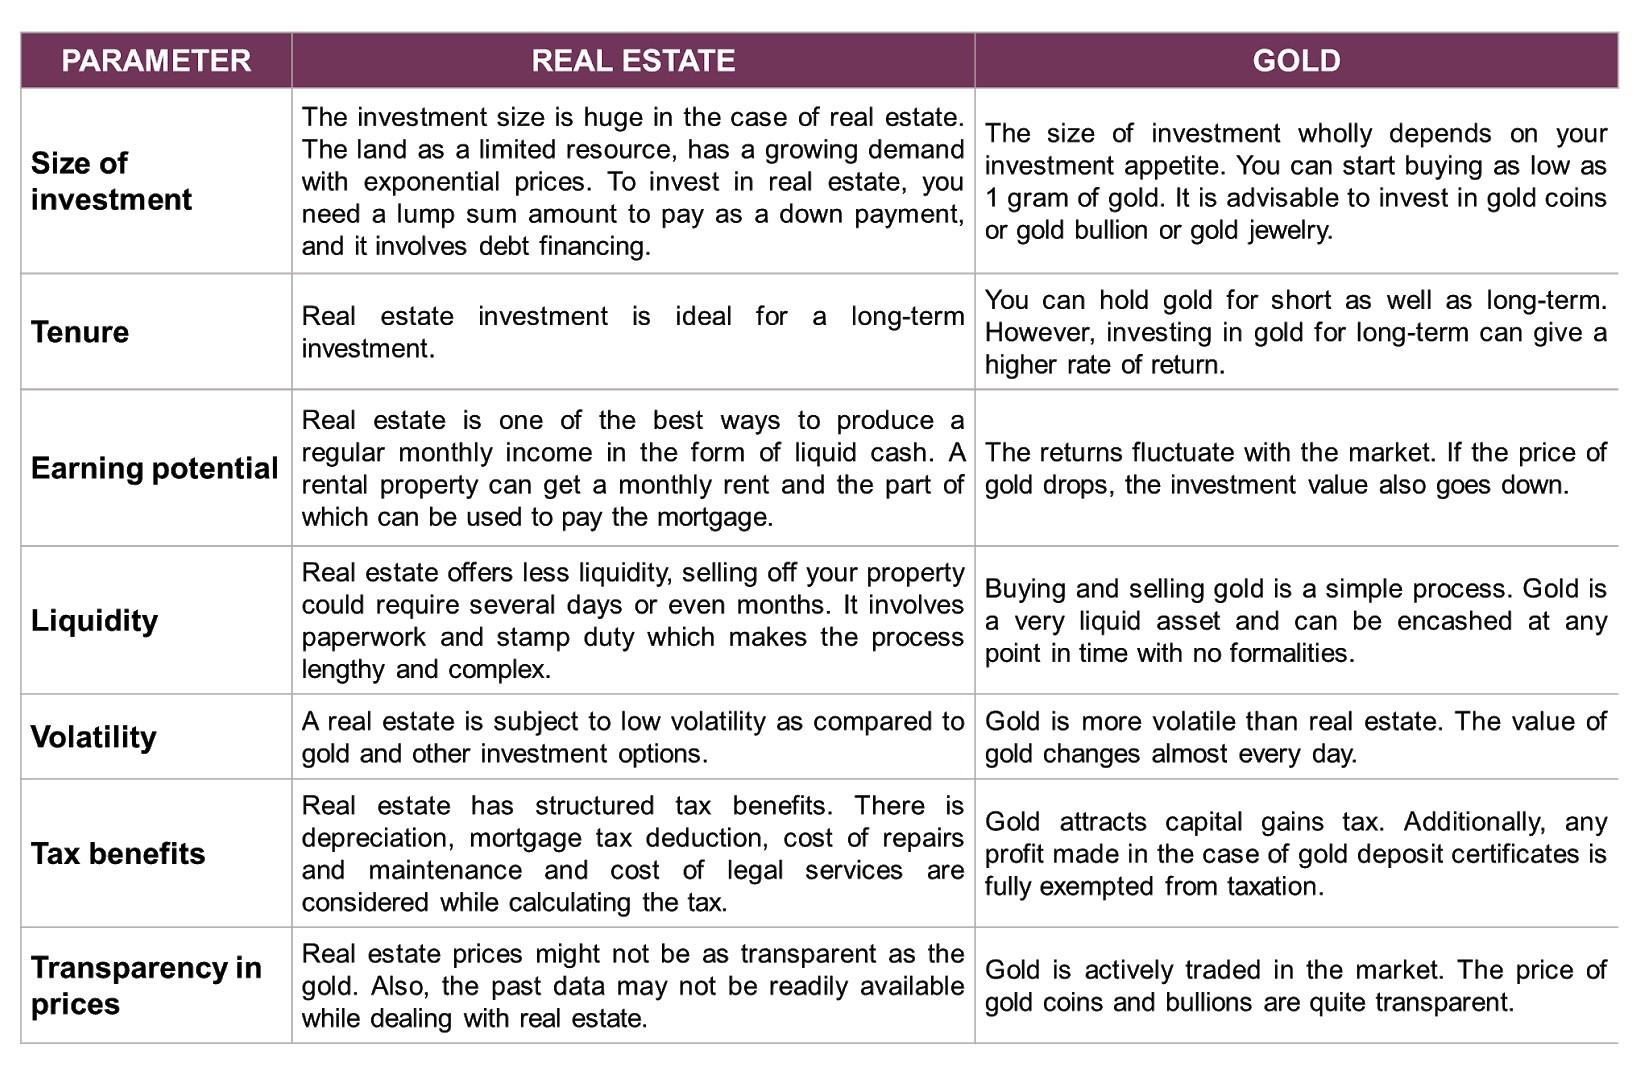 Real Estate vs Gold